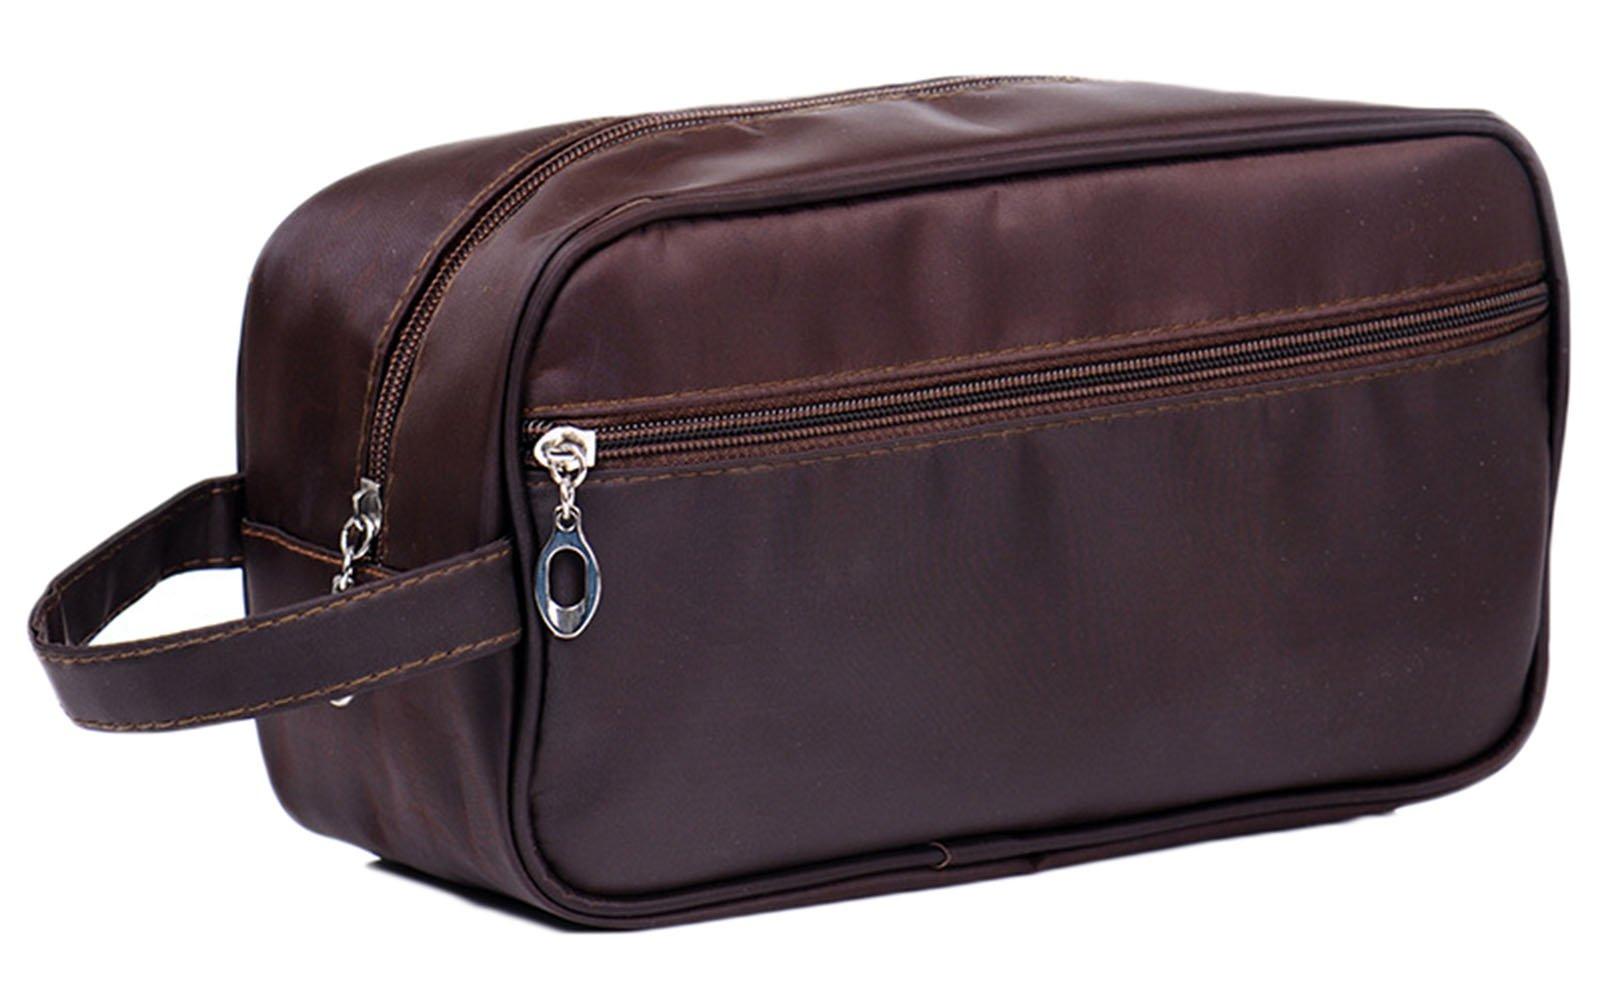 Isuperb Travel Bag